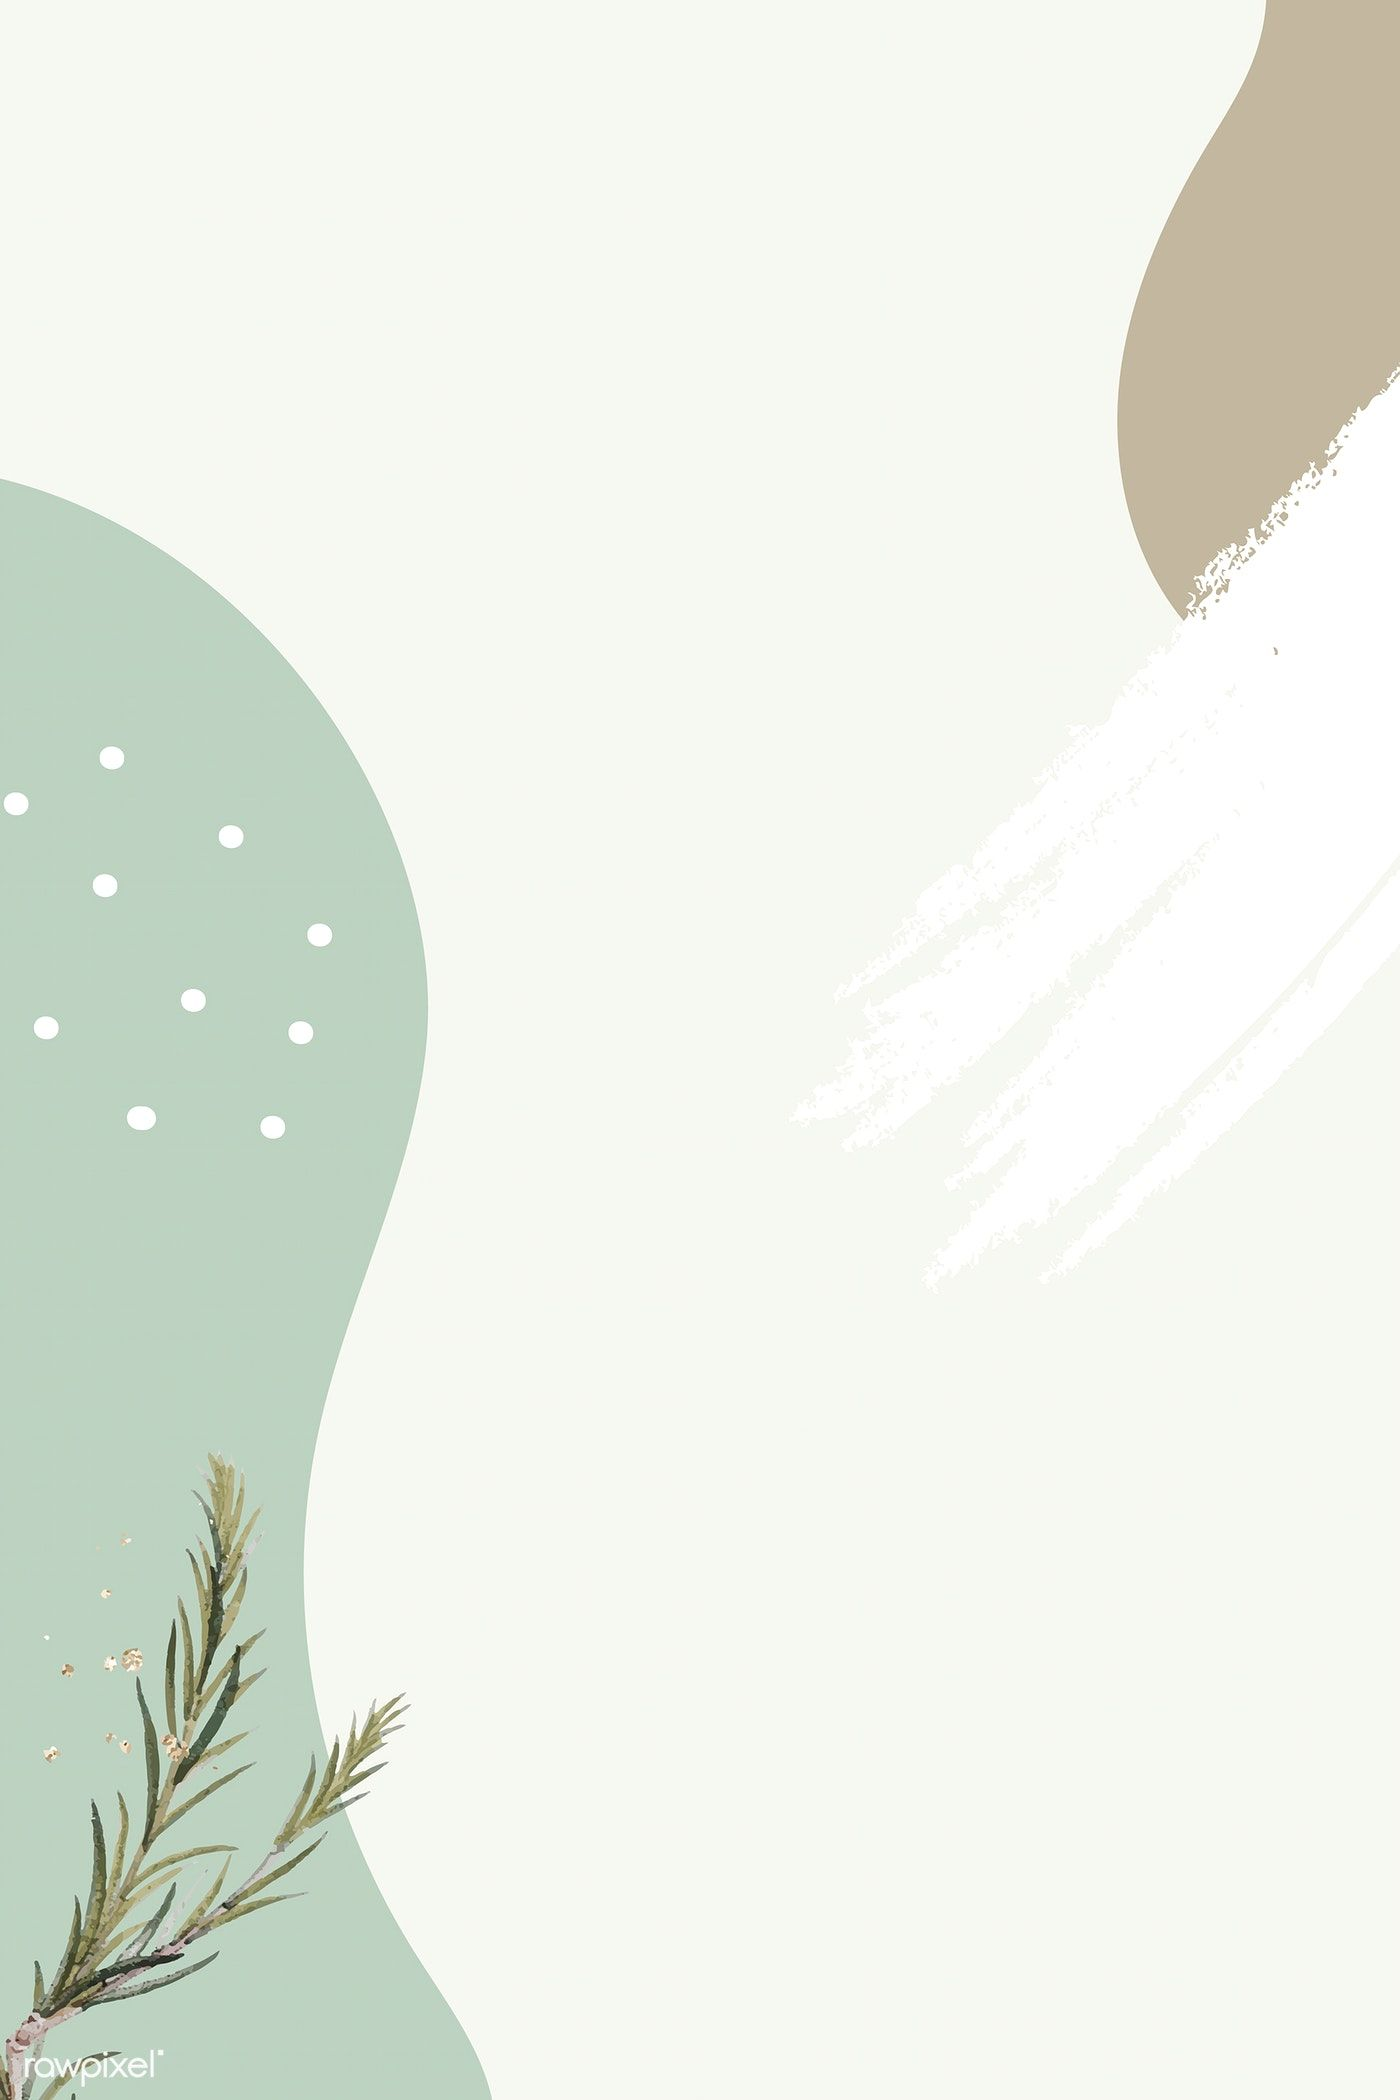 Download Premium Vector Of Swamp Paperbark Branch On Green Minimal Latar Belakang Seni Abstrak Fotografi Abstrak